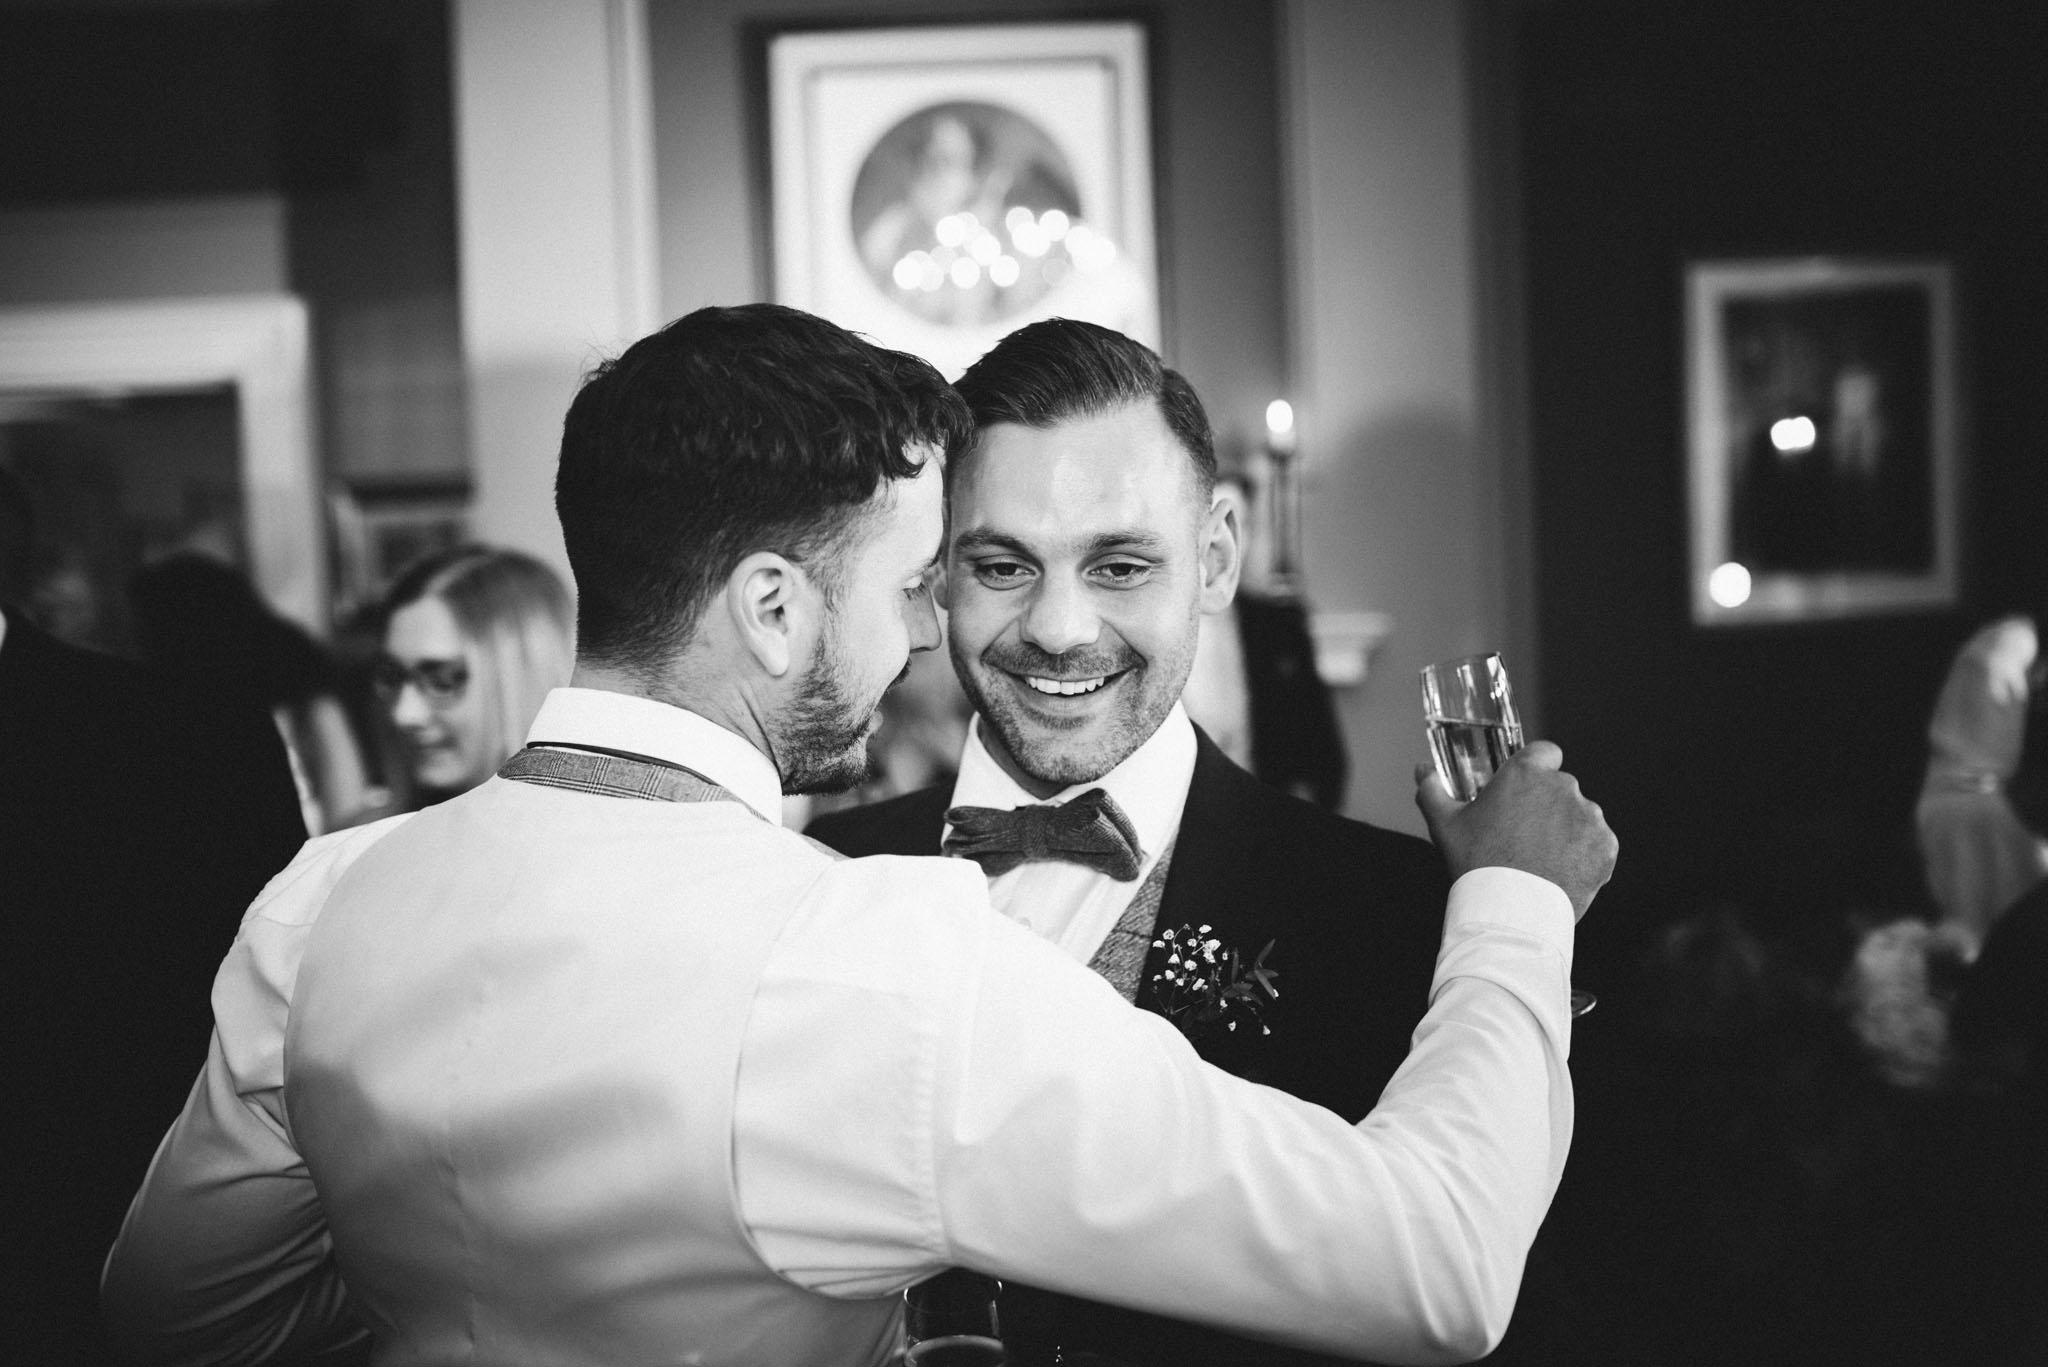 wedding-photographer-glewstone-court-hereford-scott-stockwell-photography404.jpg